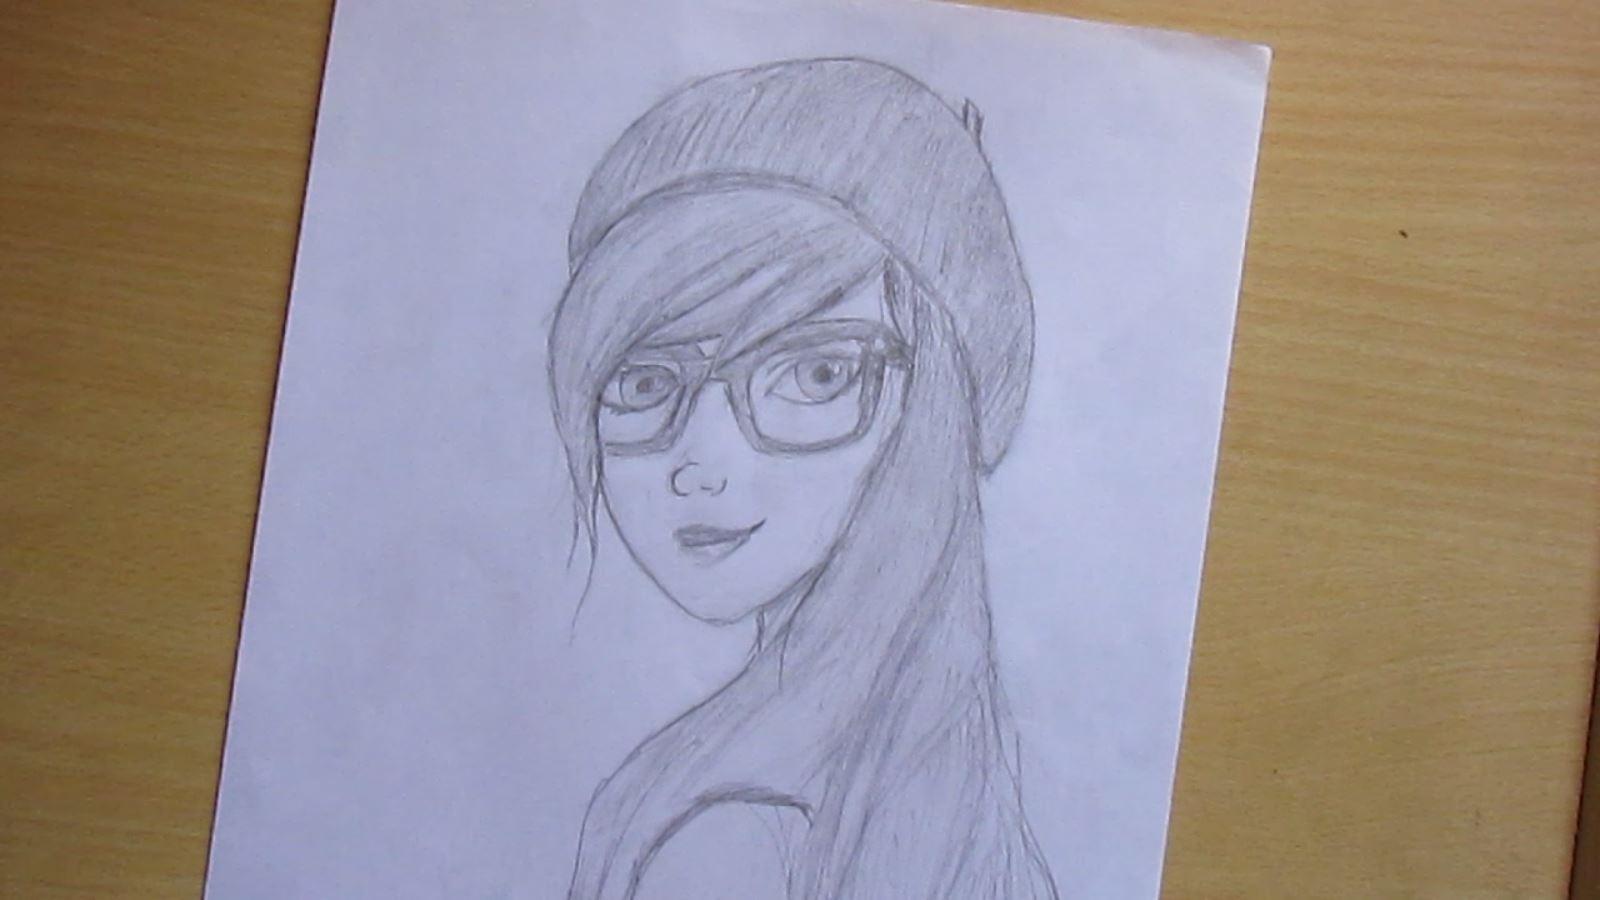 The Nerd girl Pencil sketch